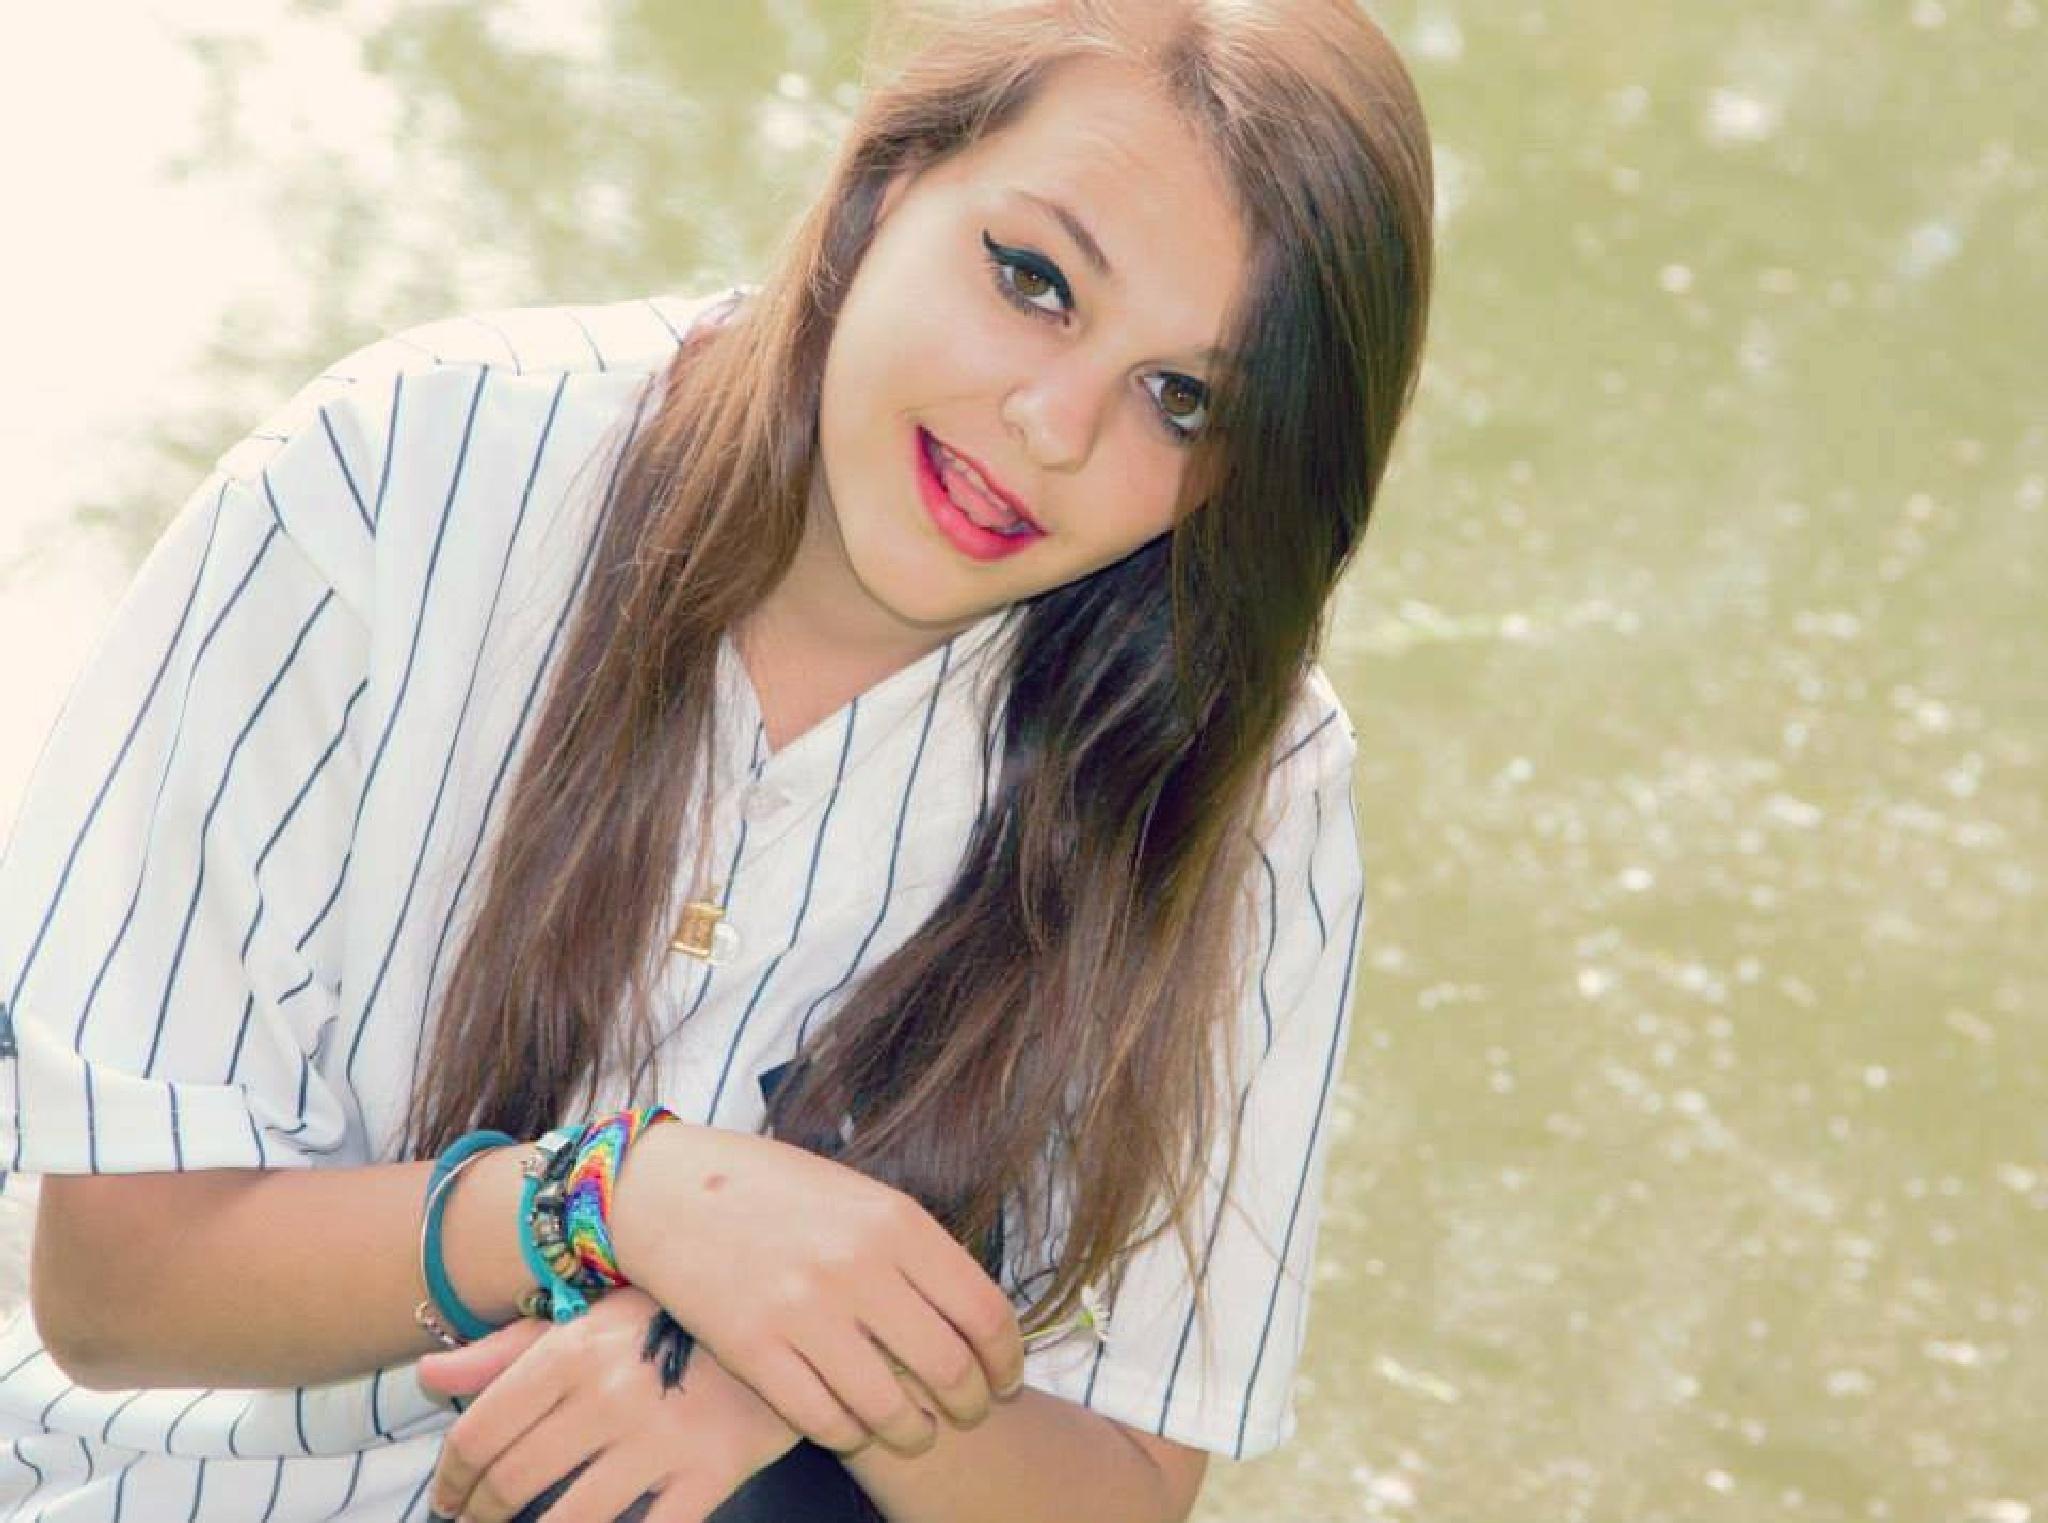 simple girl by Mahmudur Rahman Khan